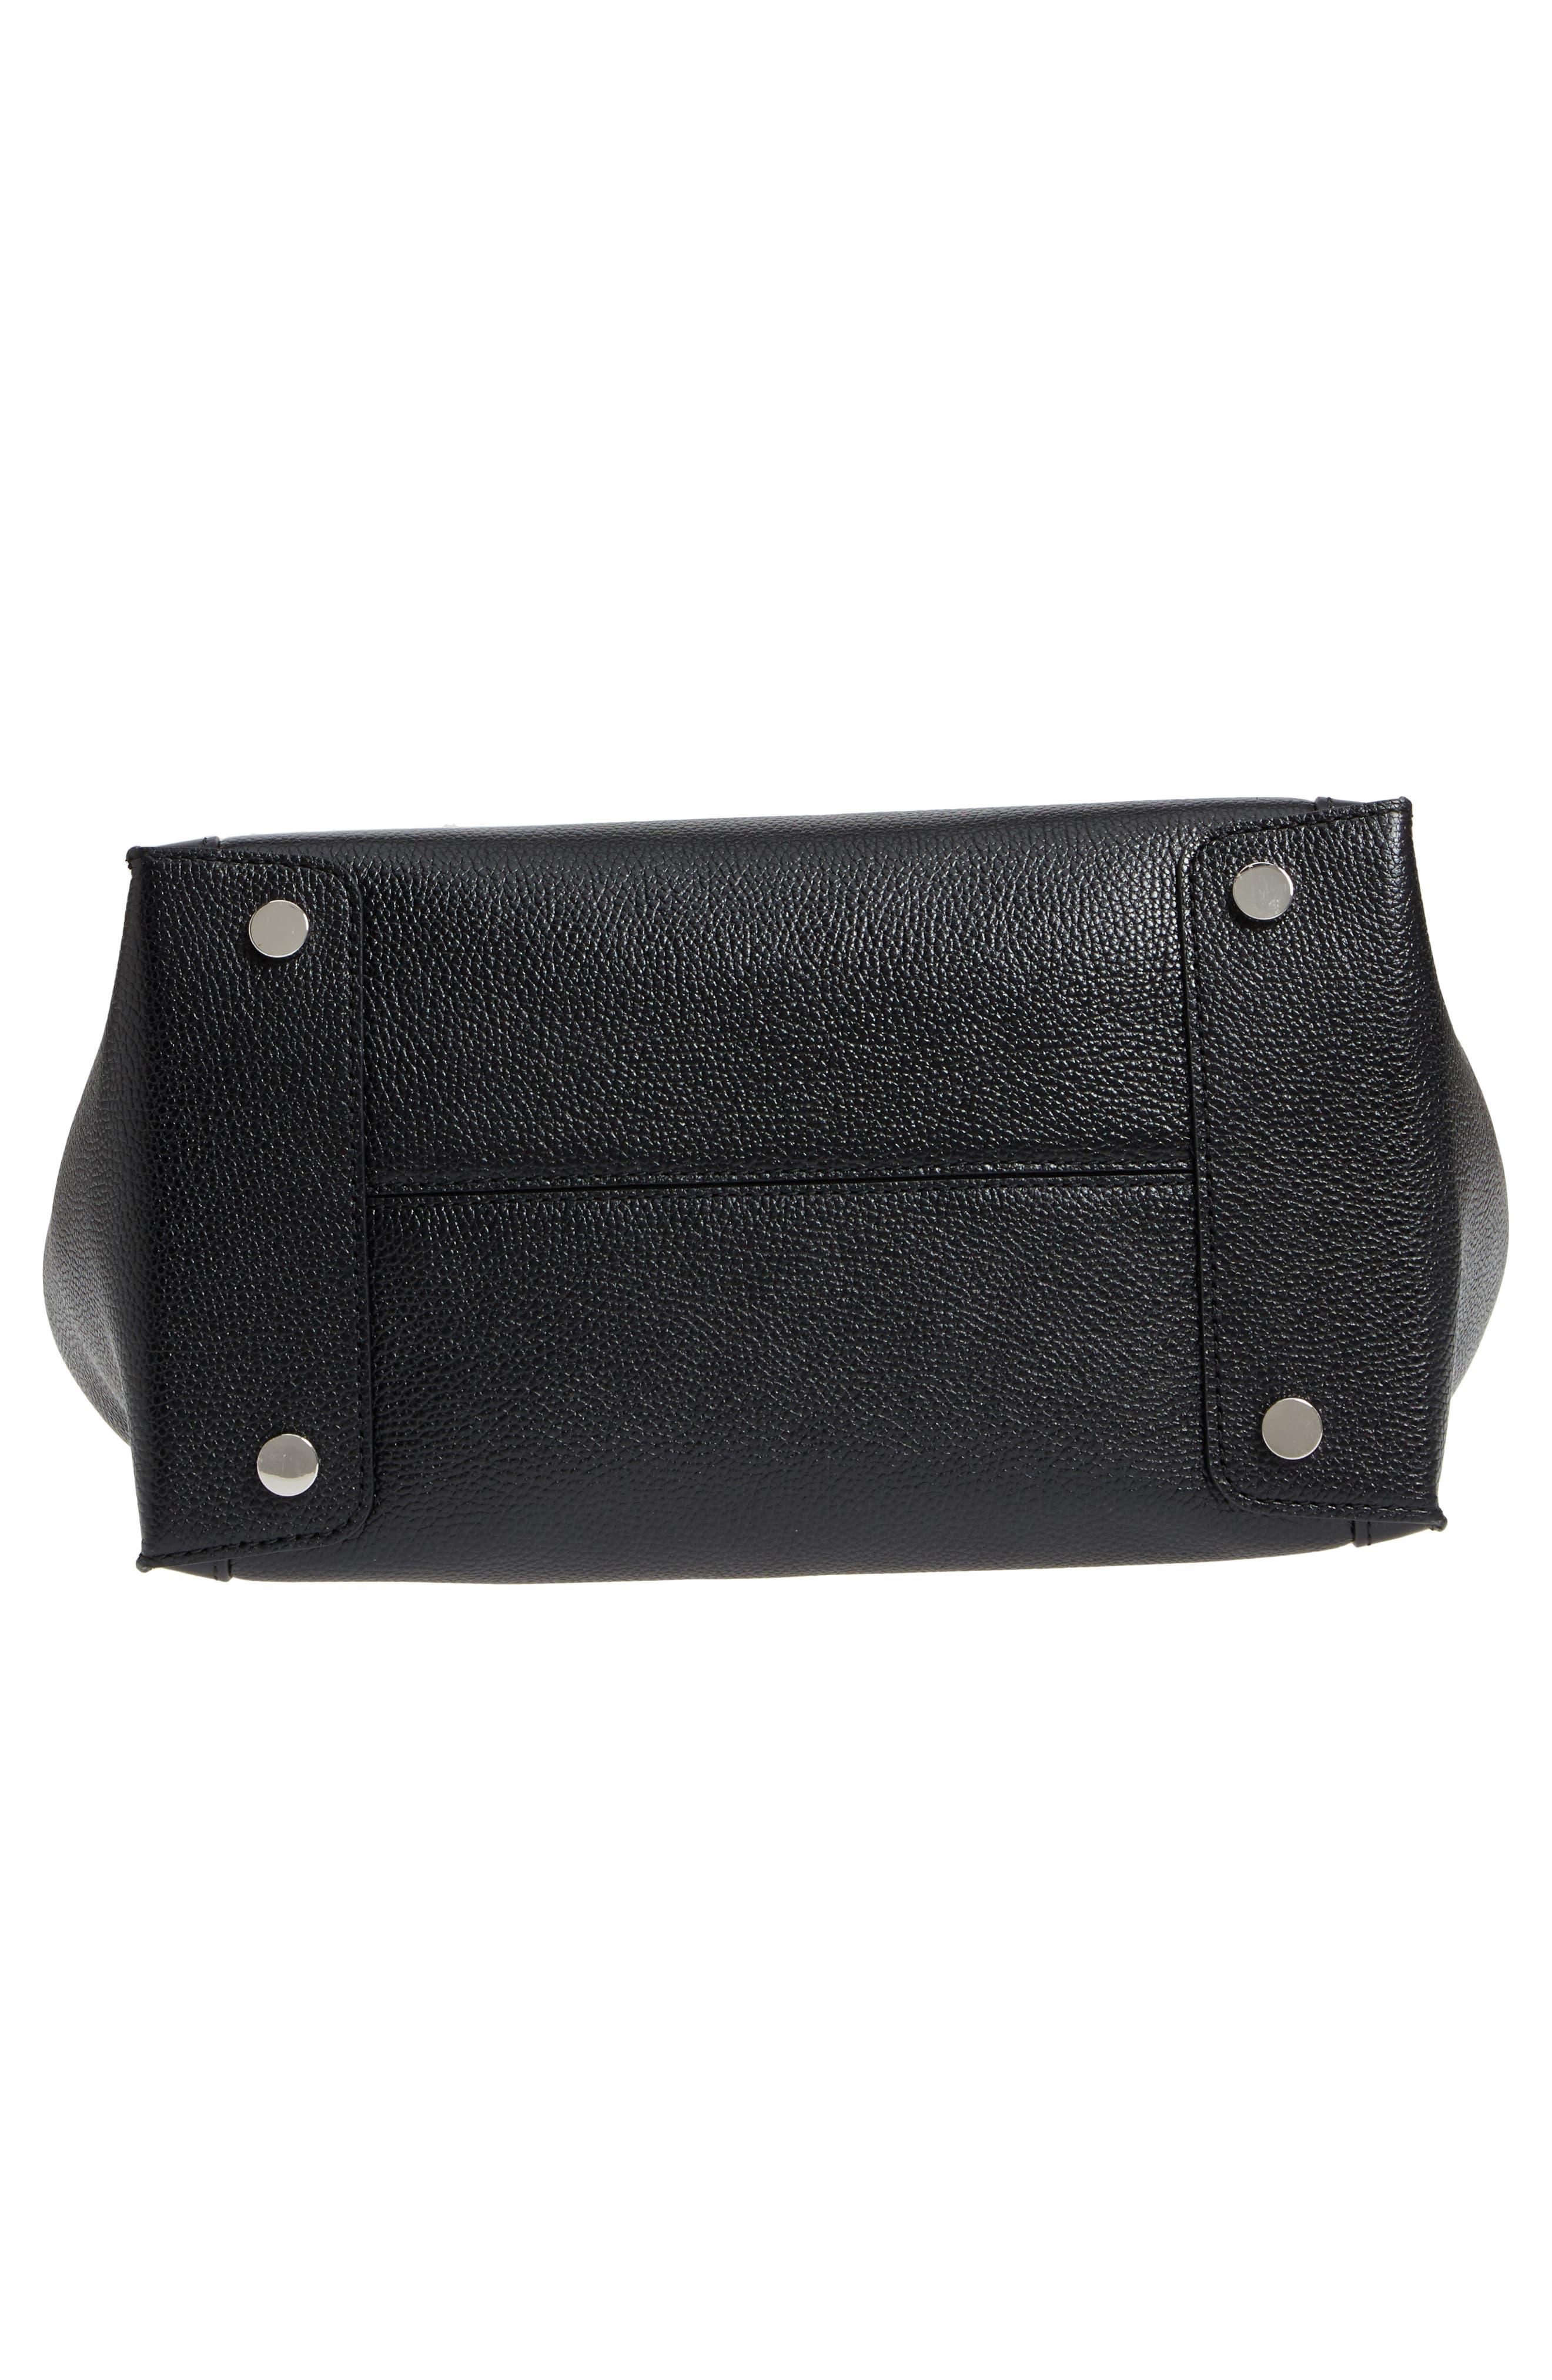 MICHAEL Michael Kors Mercer Studio Leather Tote,                             Alternate thumbnail 6, color,                             Black